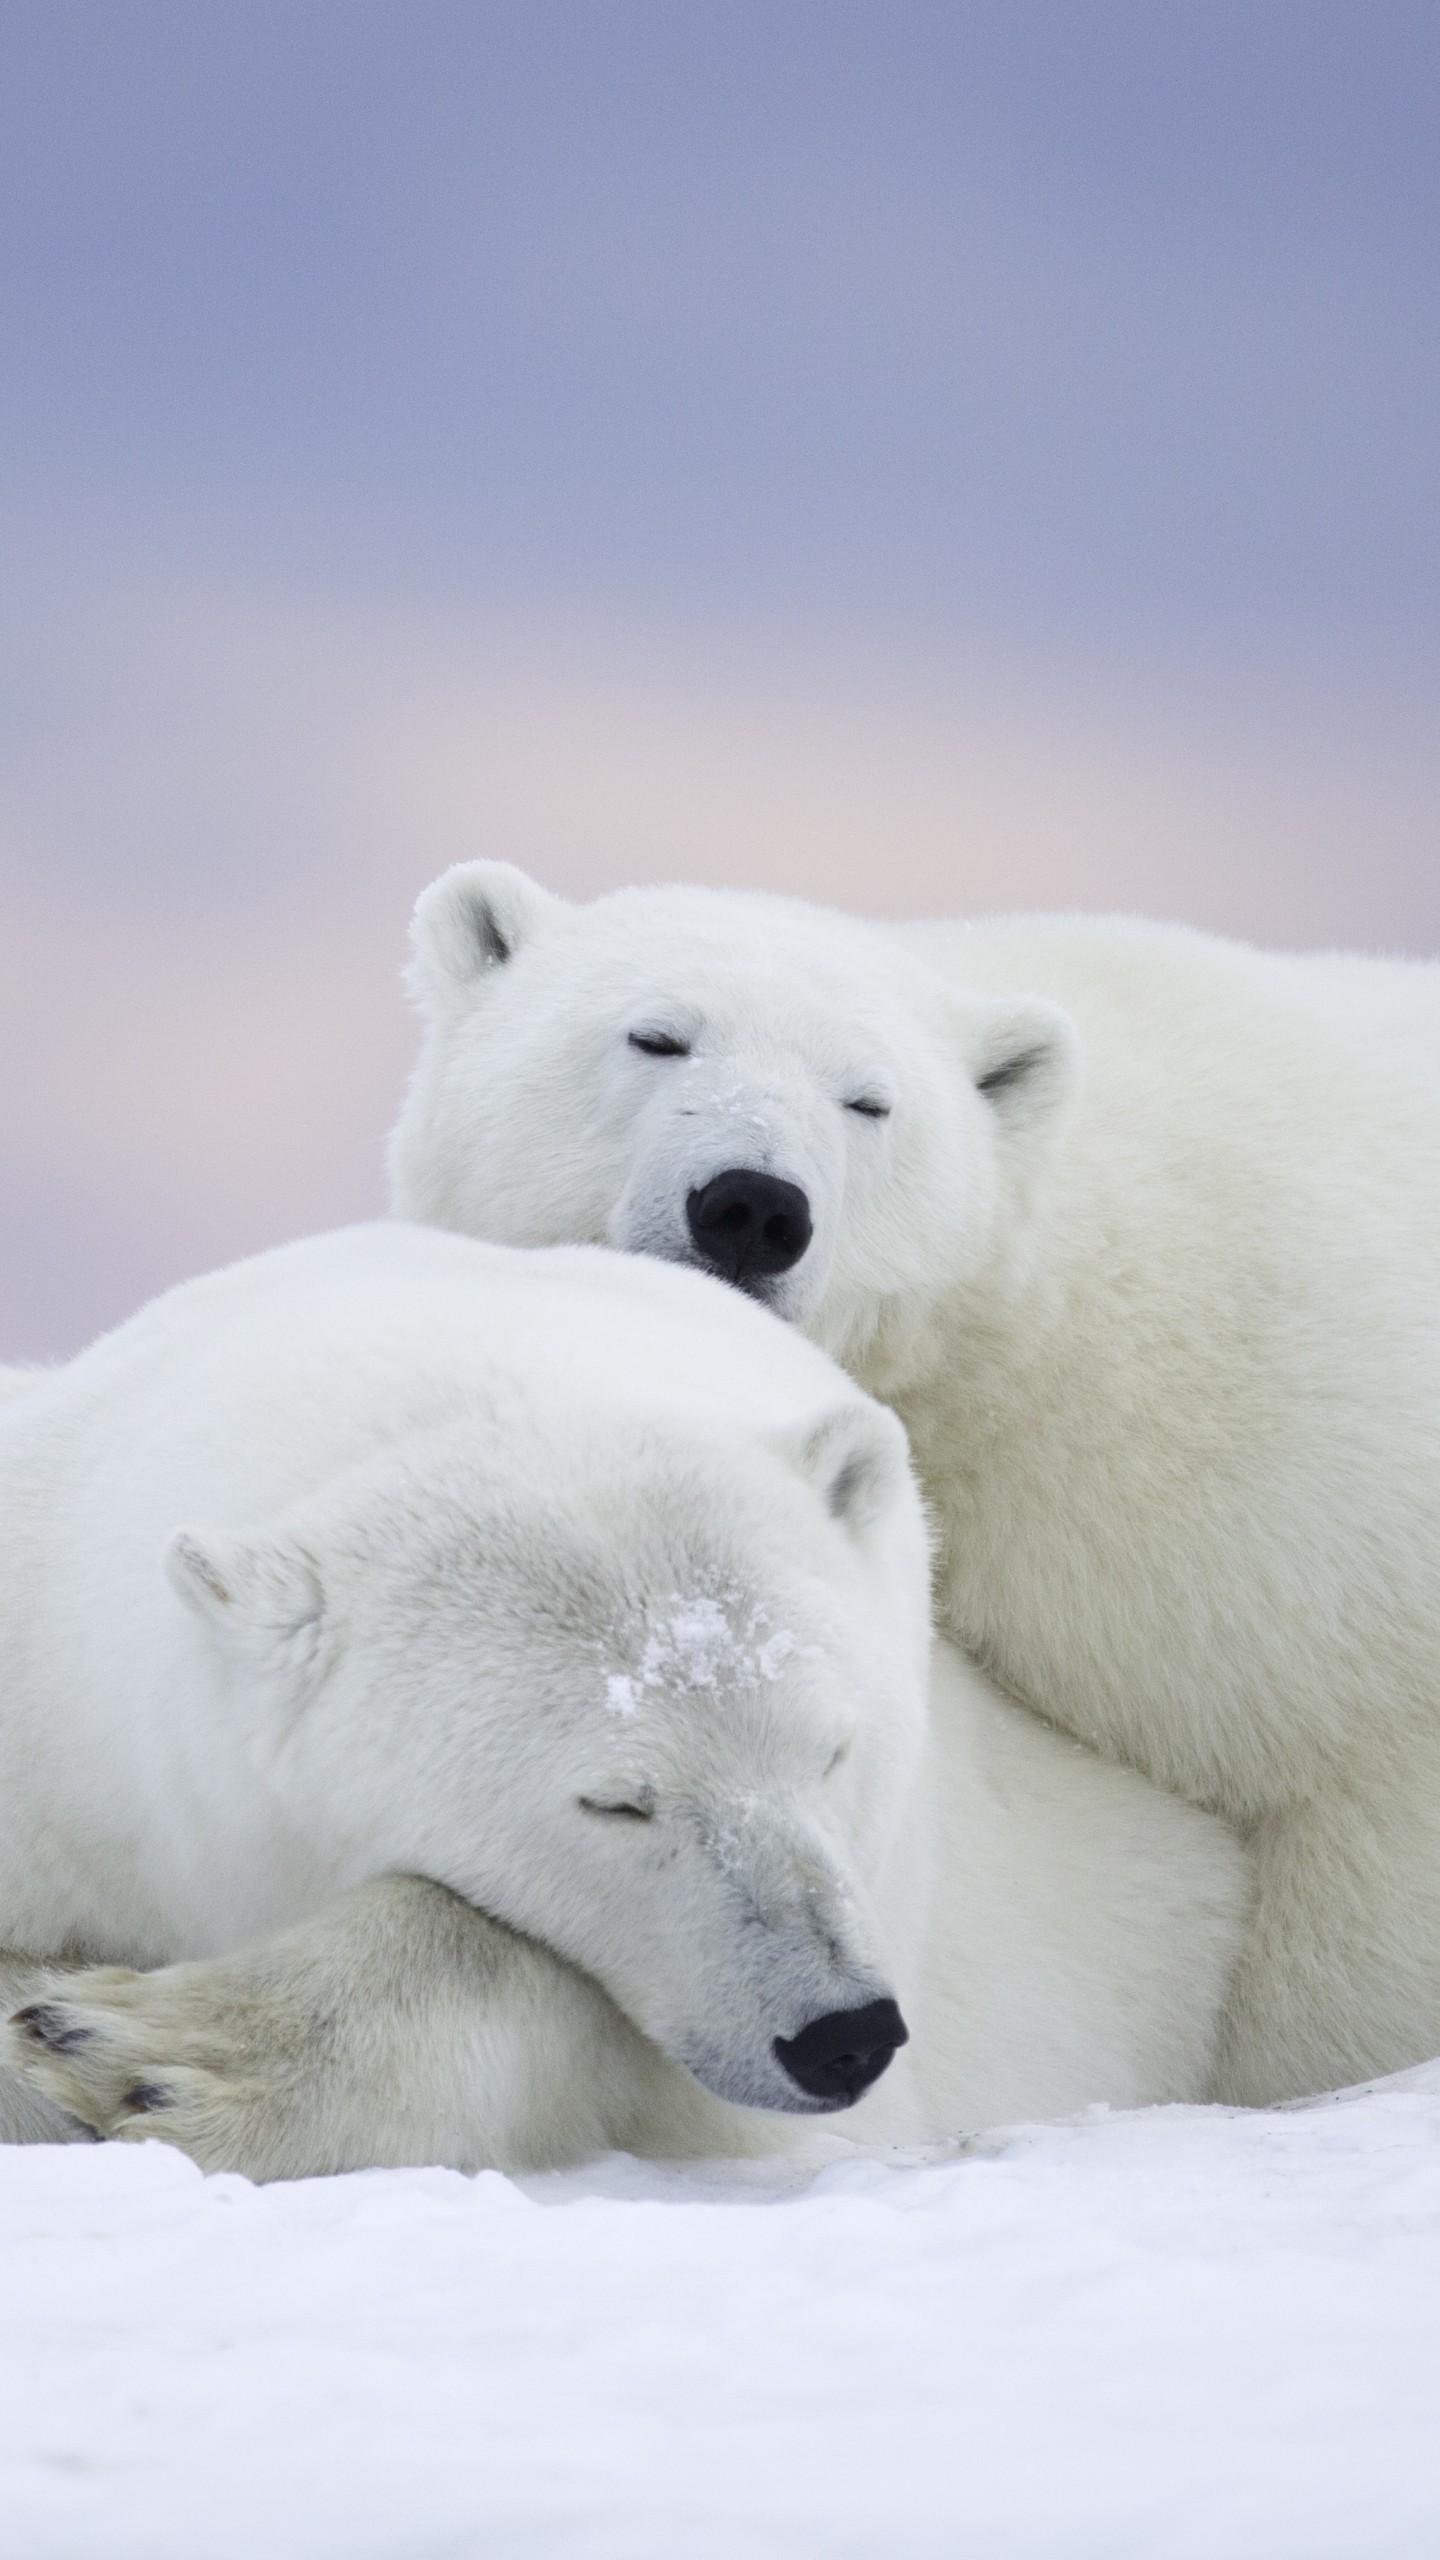 wallpaper polar bears cute animals winter 5k animals. Black Bedroom Furniture Sets. Home Design Ideas